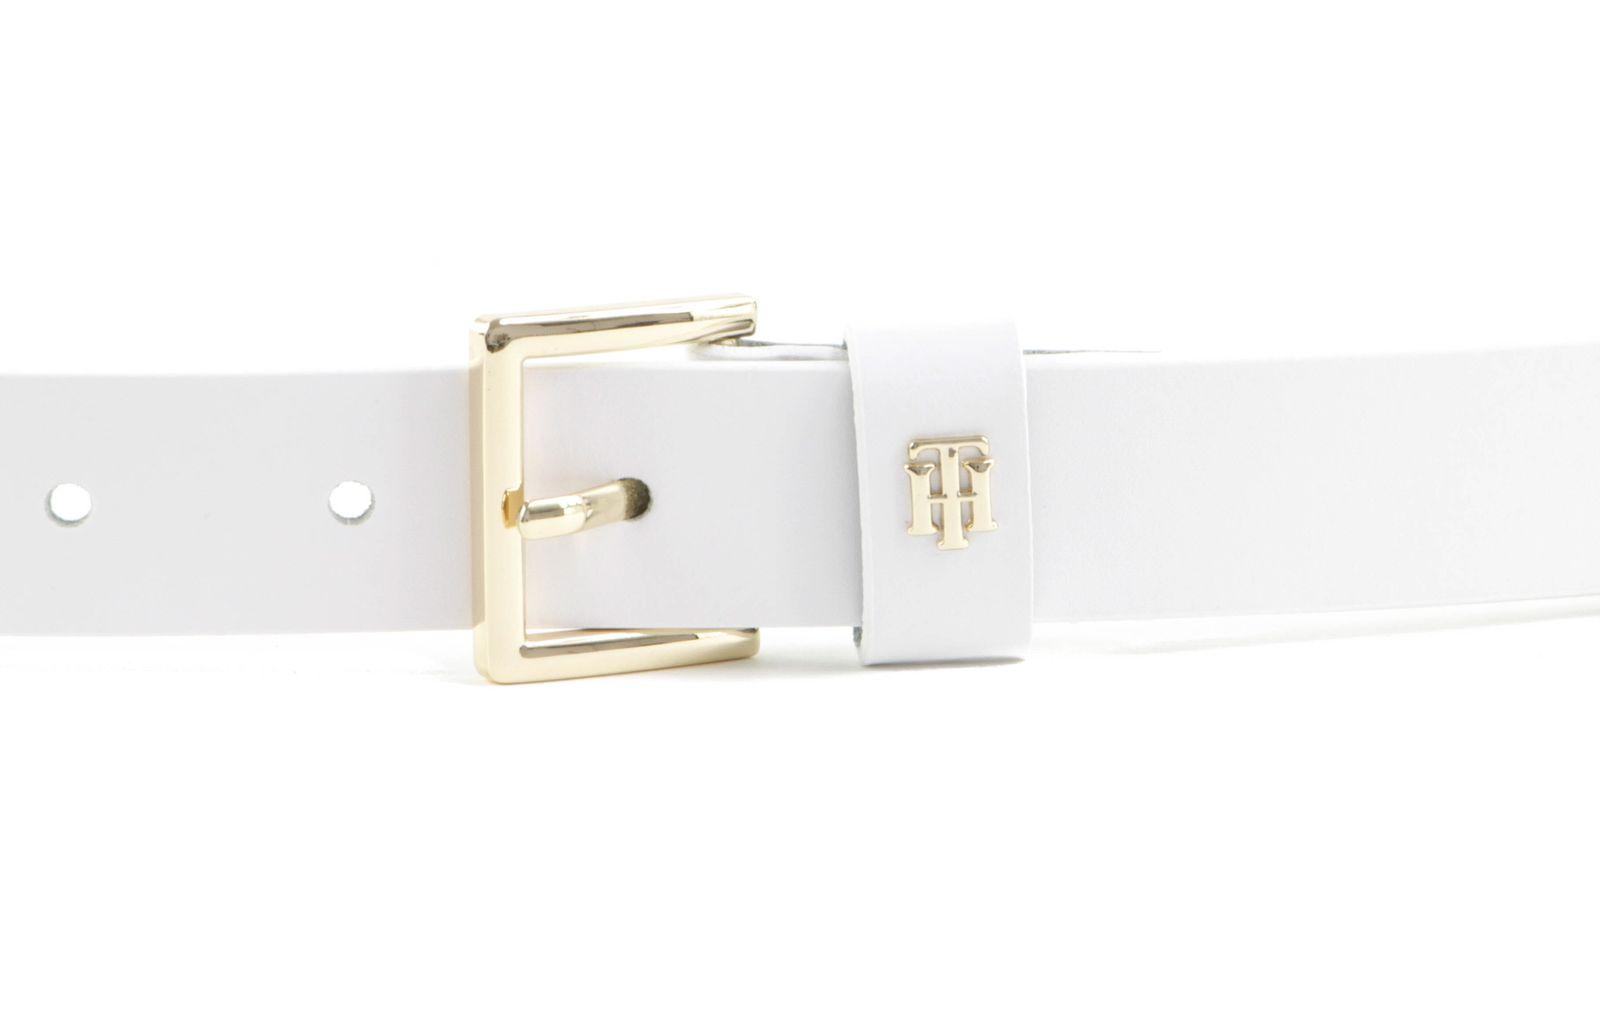 TOMMY HILFIGER Square Buckle Belt 2.5 W75 White